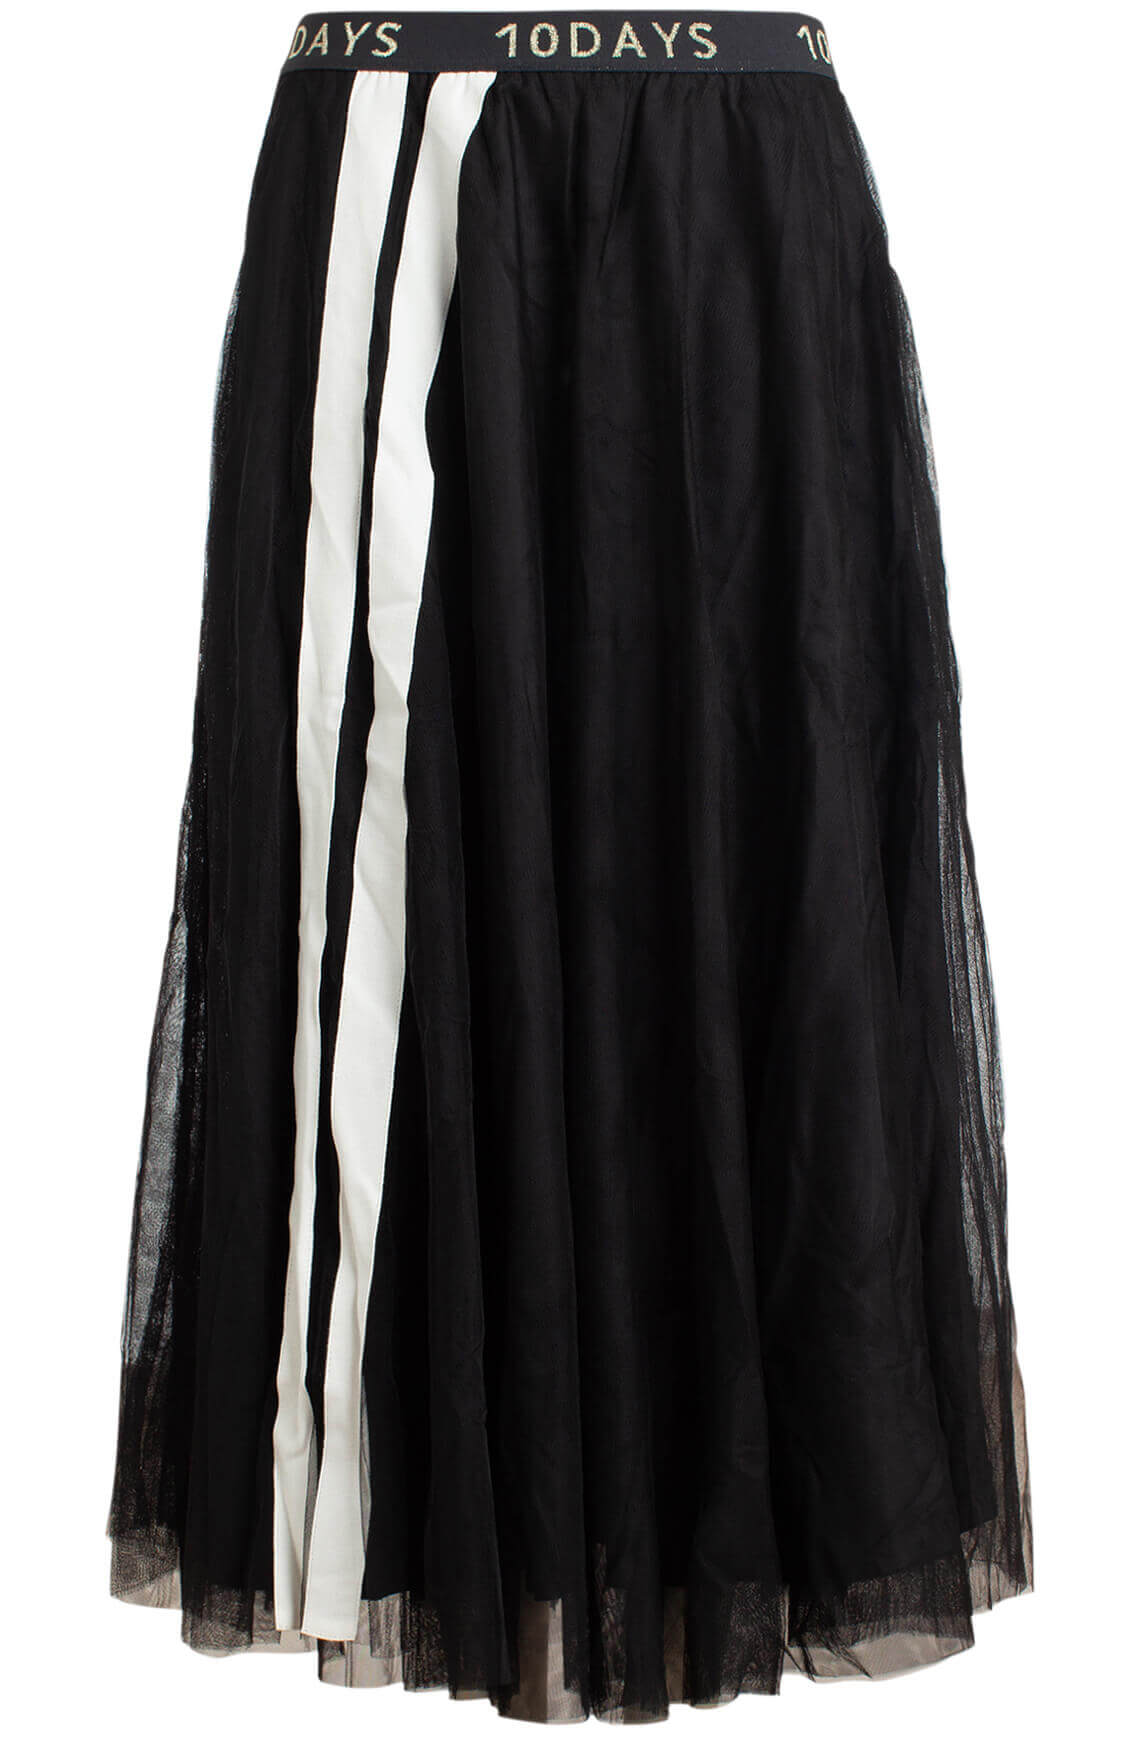 10 Days Dames Petticoat rok zwart